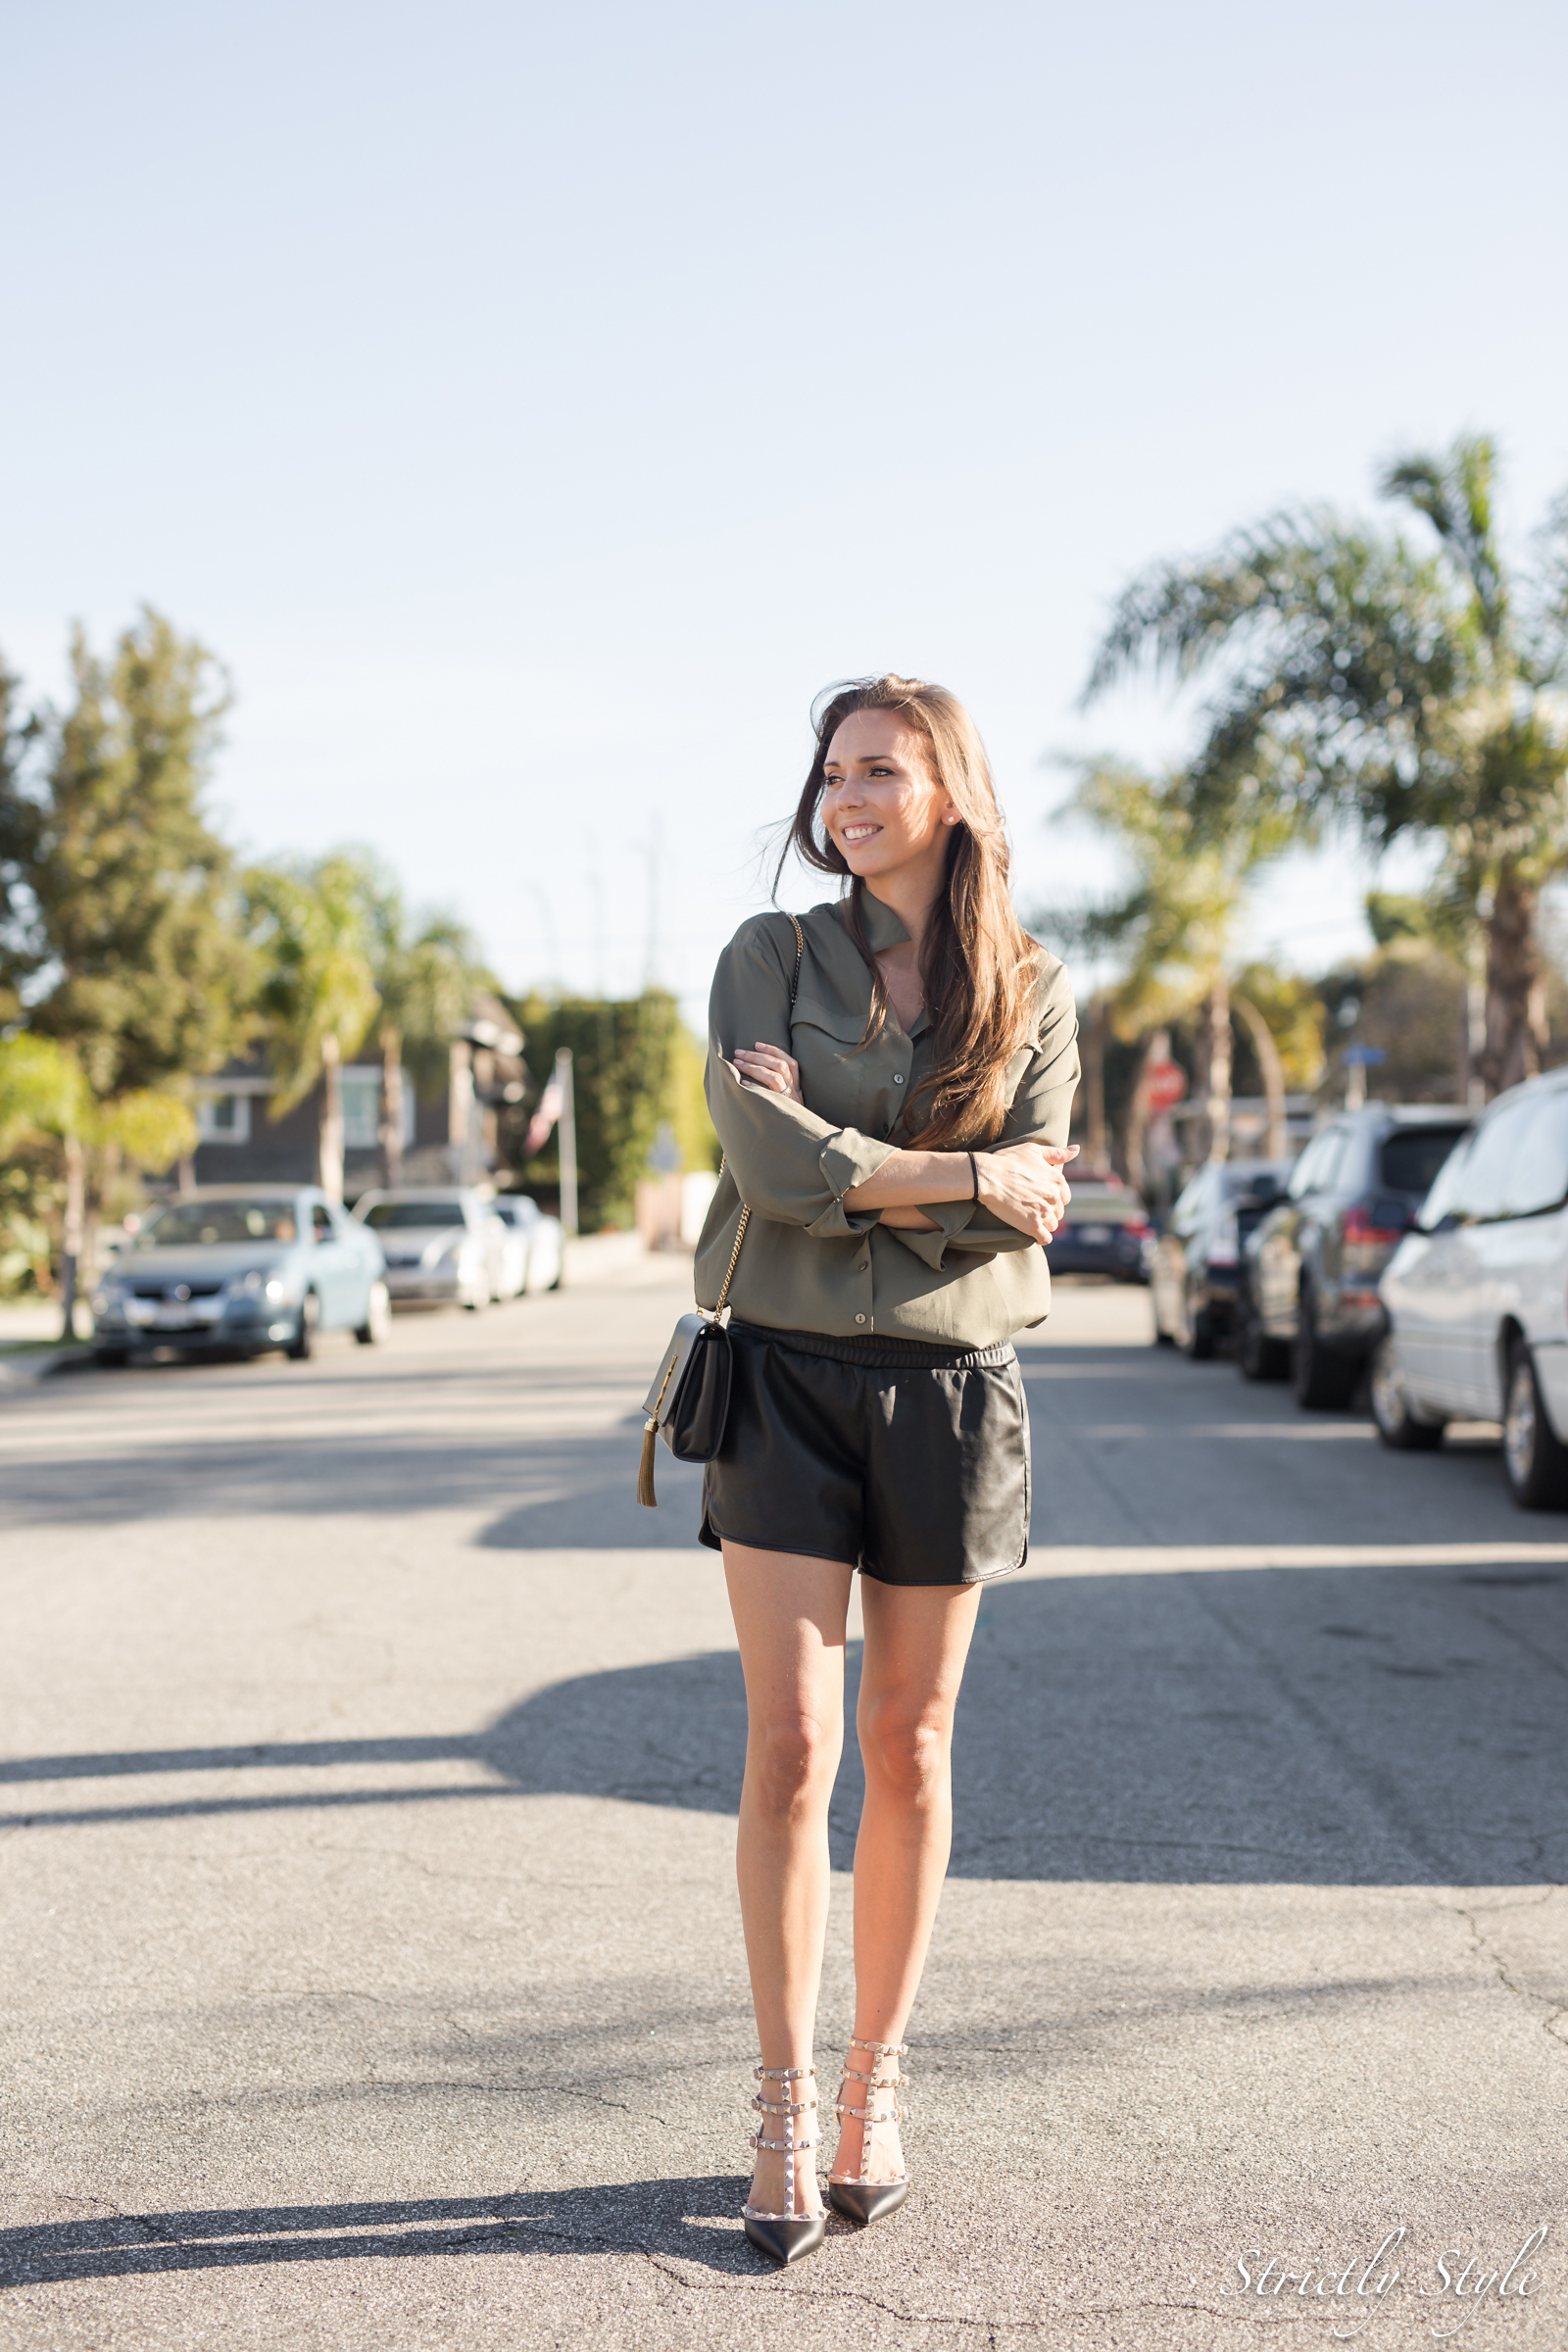 eka asu losissa valnrtino rockstuds black leather shorts-9875